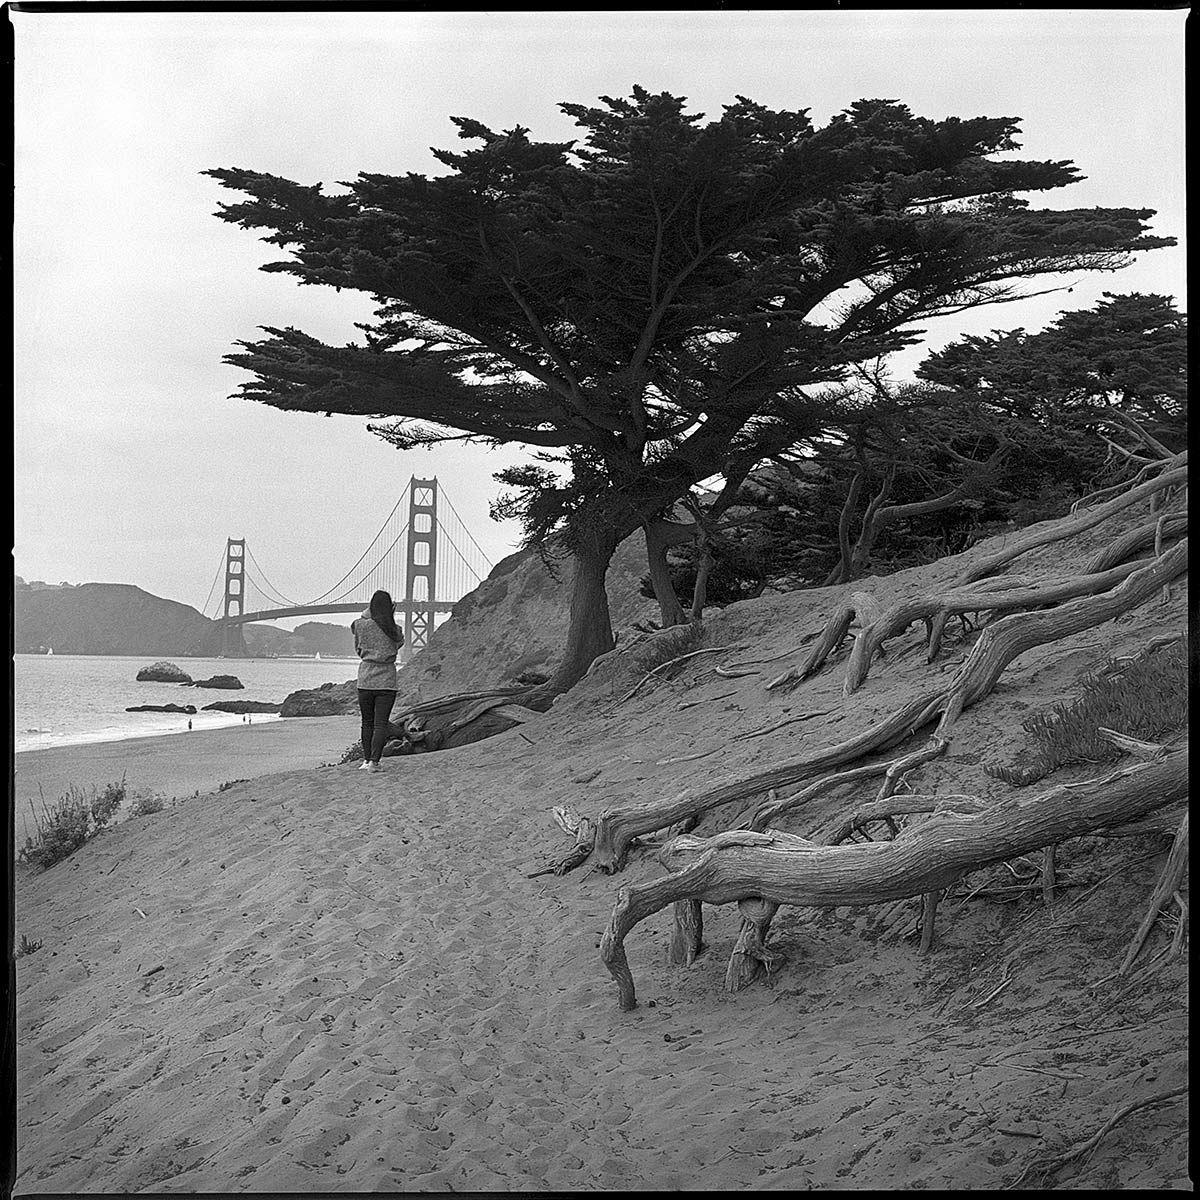 Golden Gate Bridge, b&w, film, medium format, Square format, San Francisco, Baker Beach